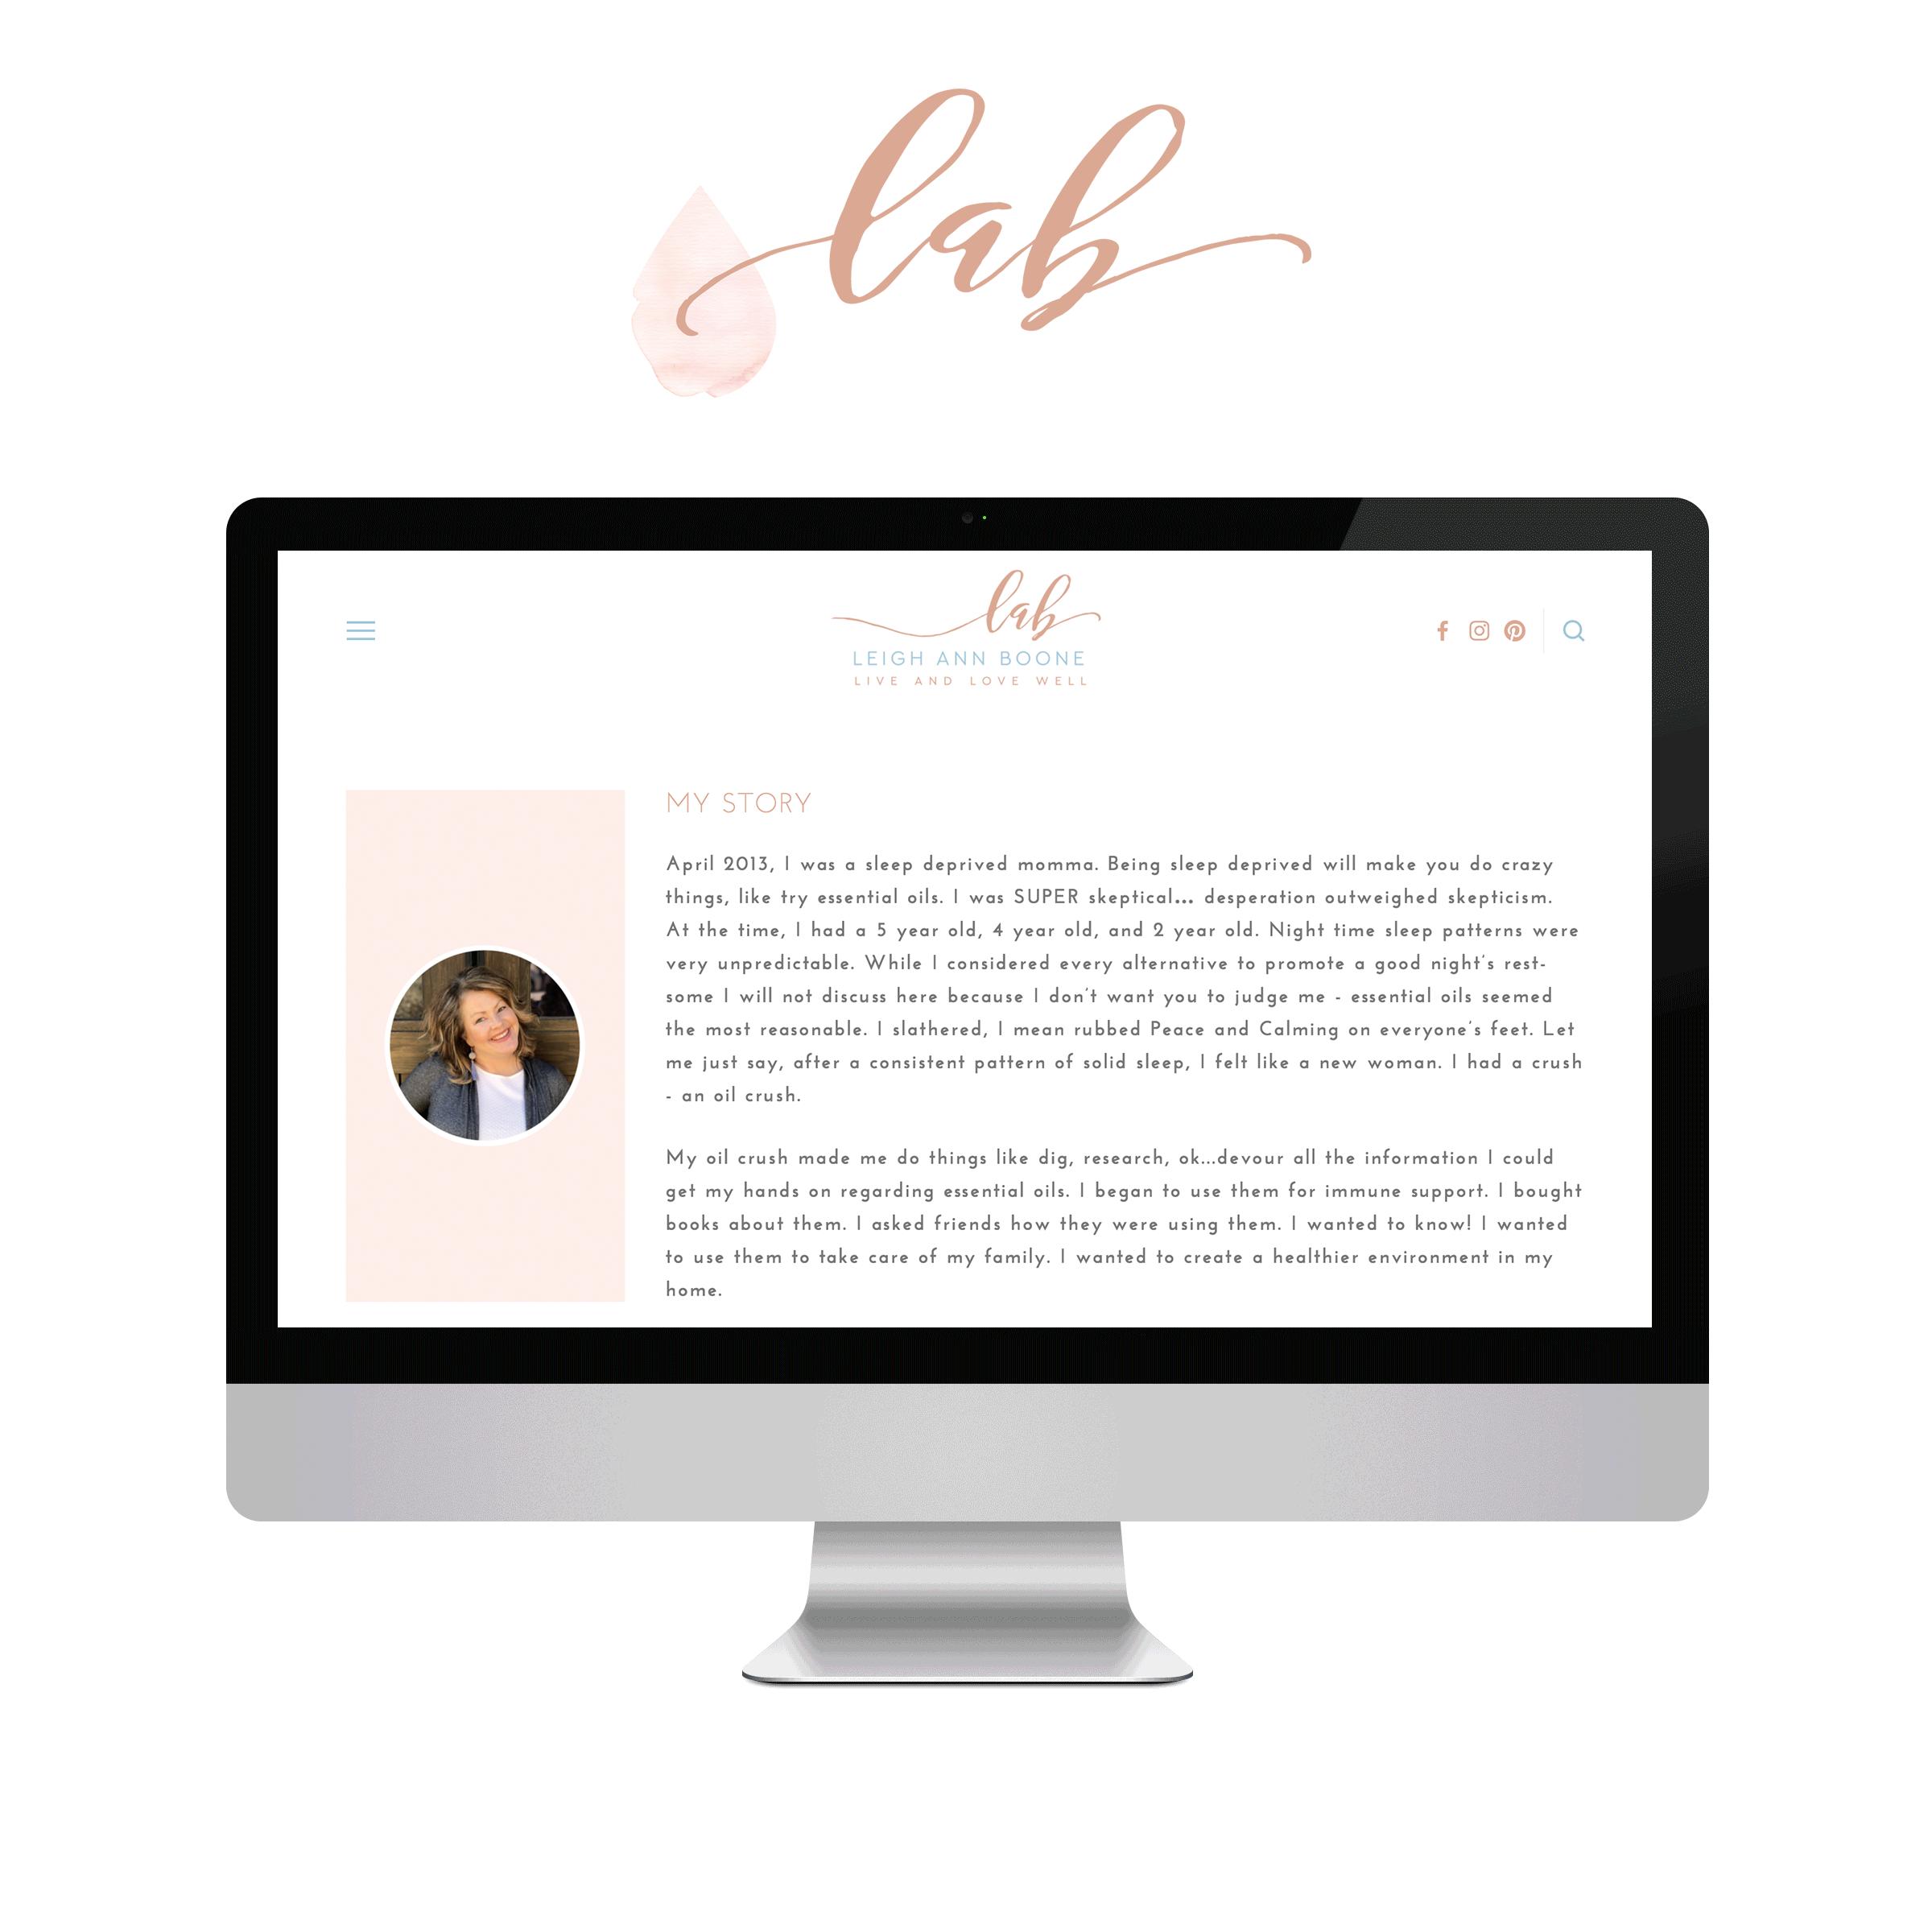 essential-oils-website-design.png